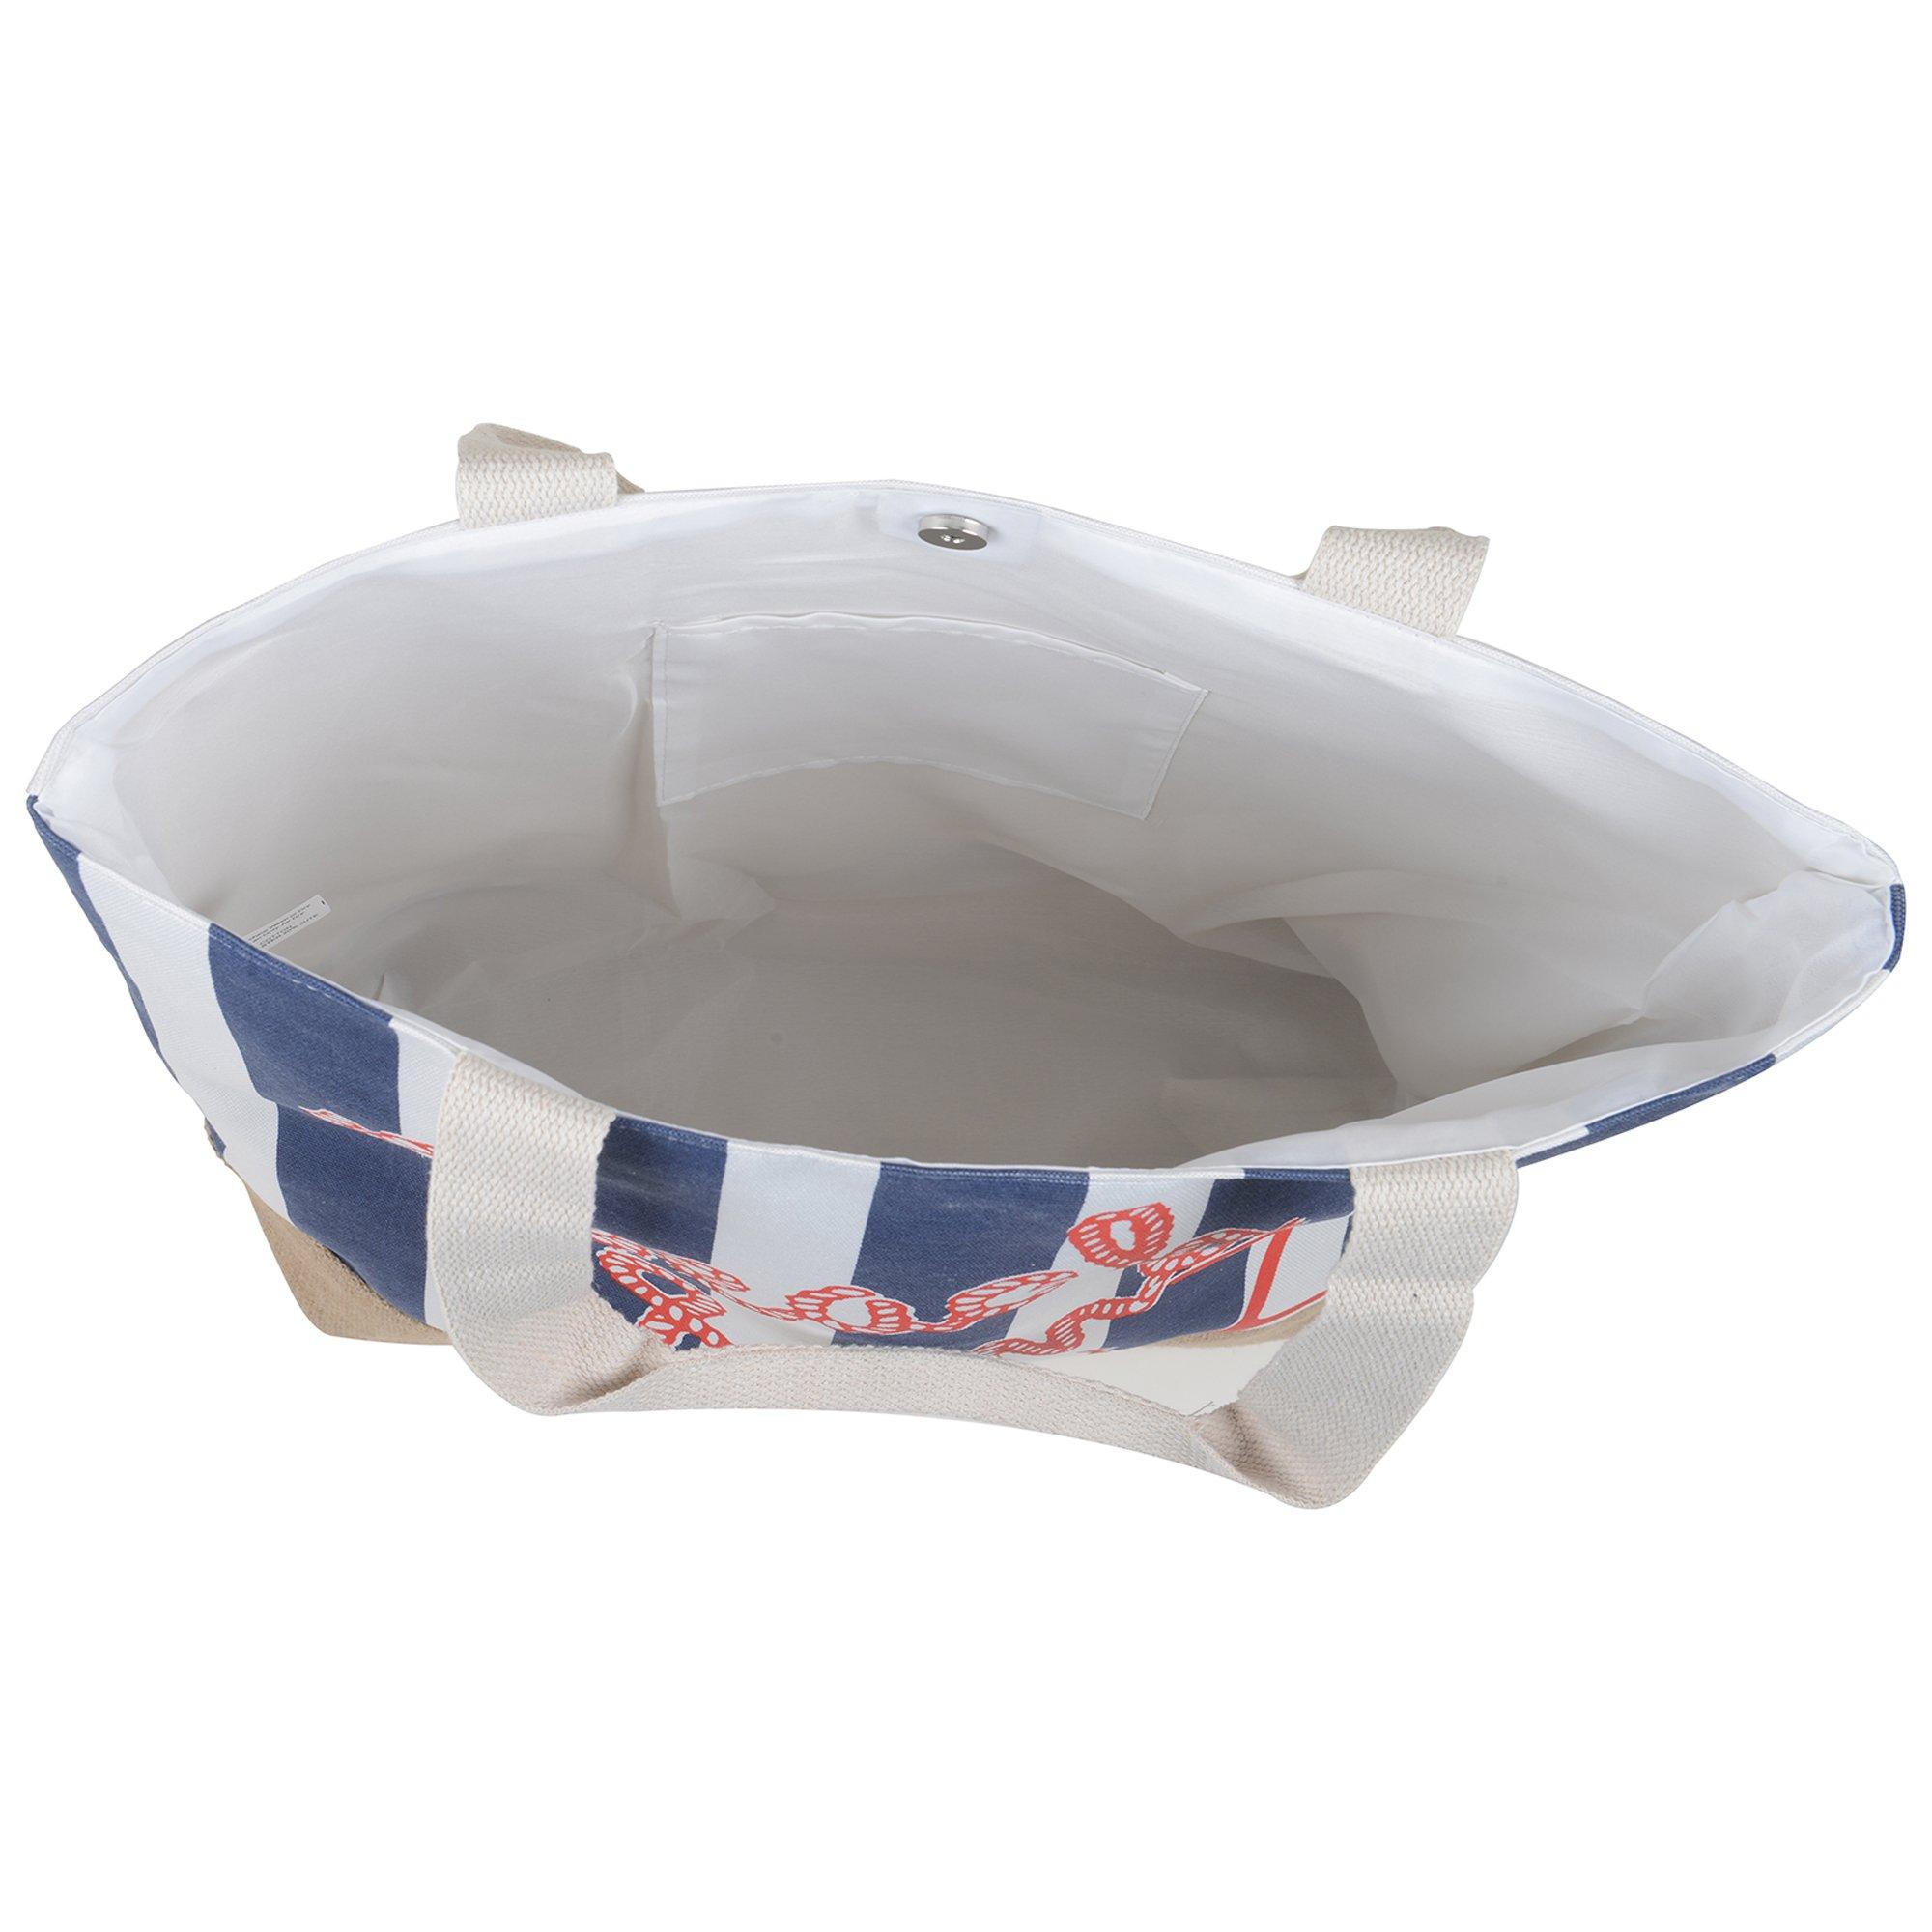 Canvas Burlap Beach & Me Printed Cotton Heavy Shoulder Straps Premium Women Tote Bag by BB (Navy Blue) by BB (Image #4)